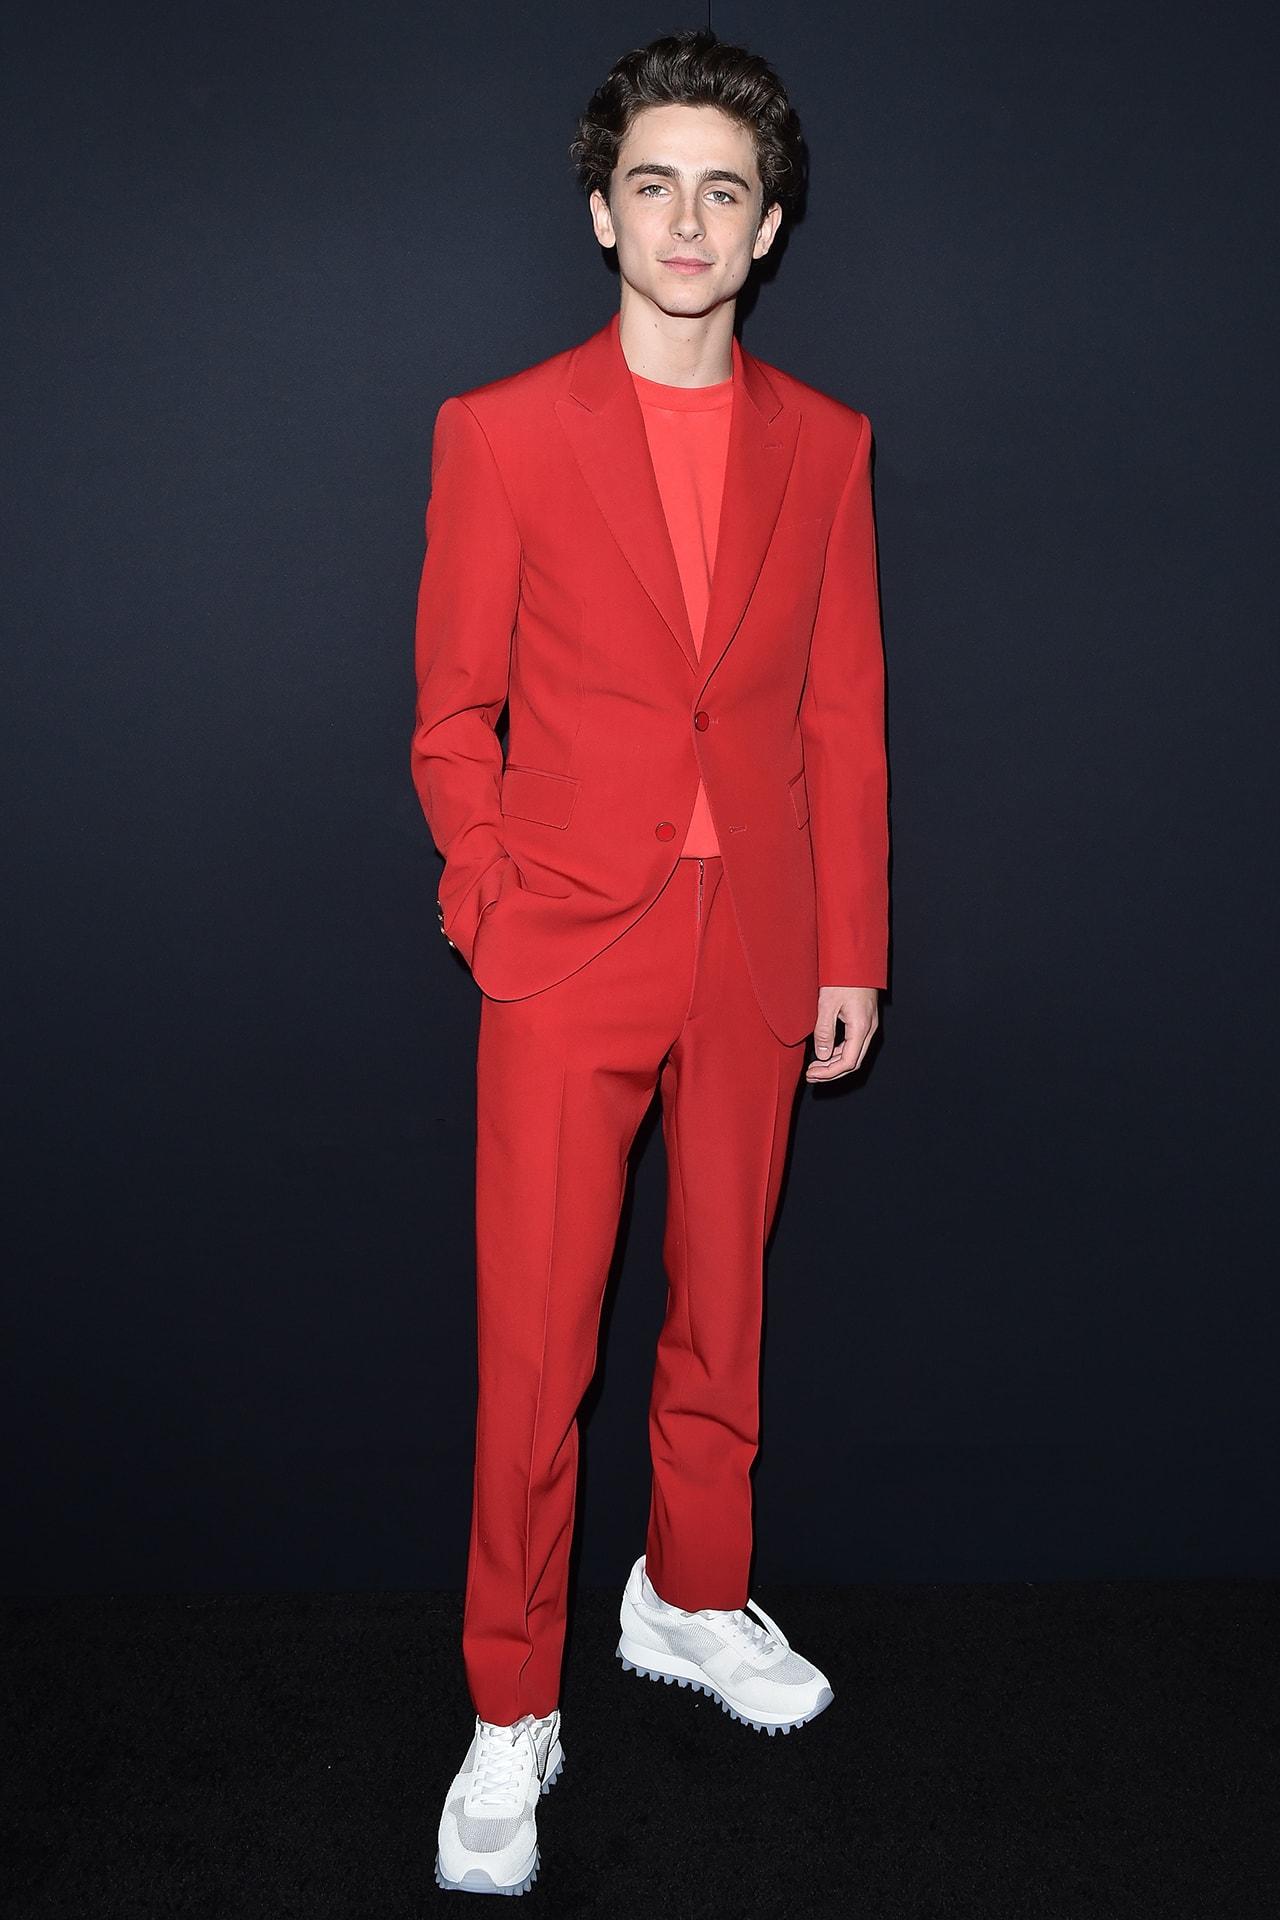 Timothee Chalamet Actor Berluti Menswear Fall/Winter 2018-2019 show Paris Fashion Week Suit Burgundy